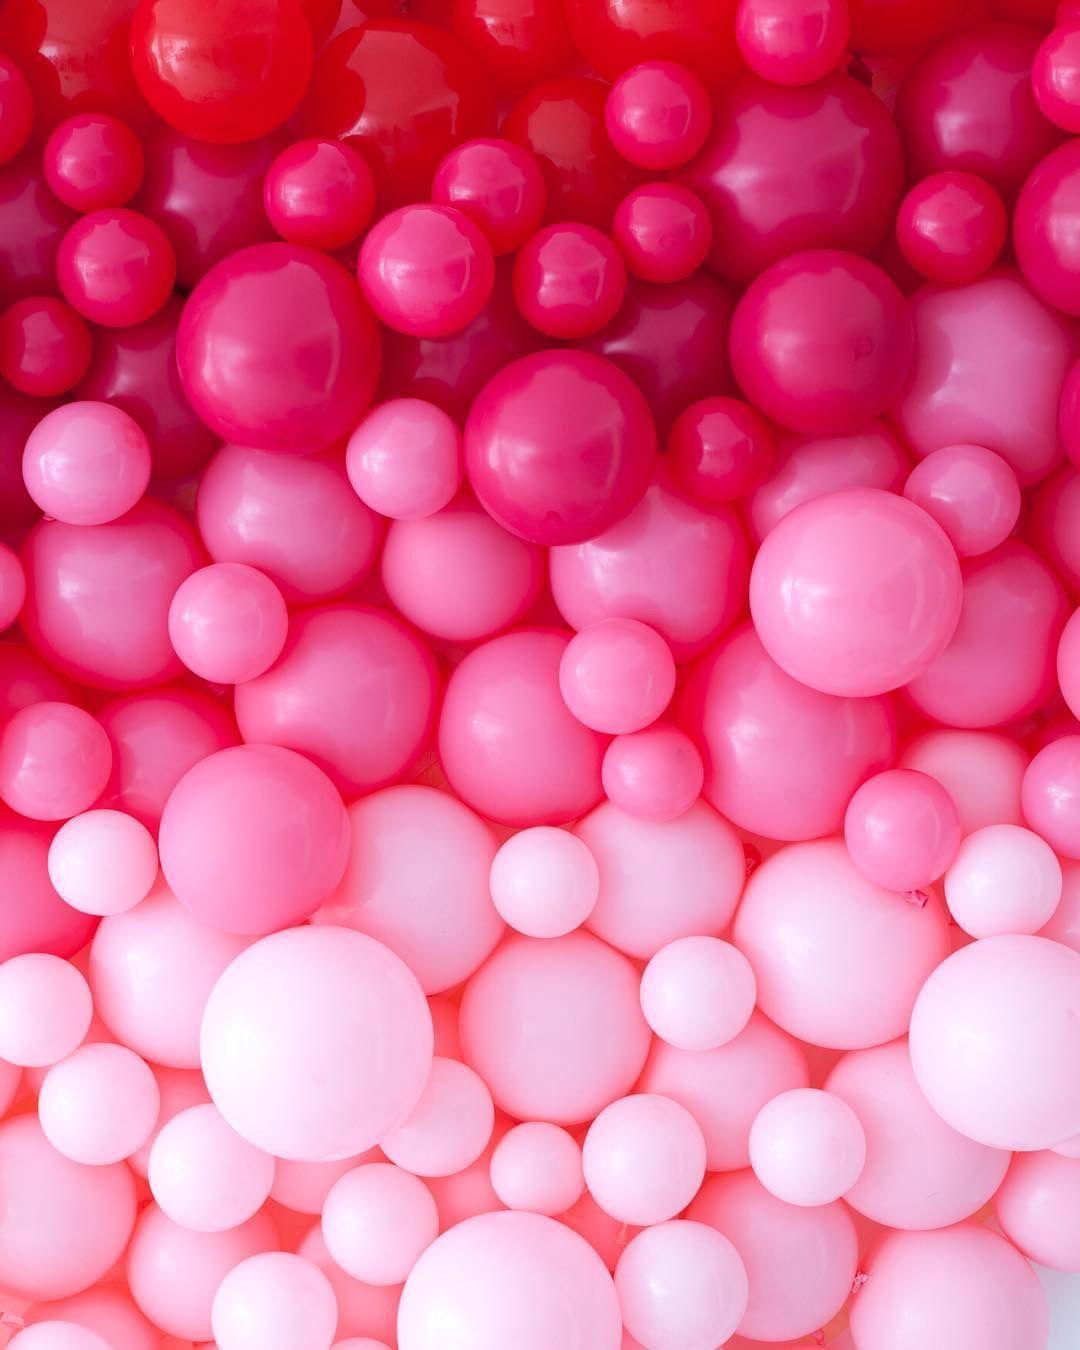 Pink Balloons Wallpaper Desktop ~ Rainbow Wallpapers Pink Balloons, Pink Bubbles, Heart Balloons,